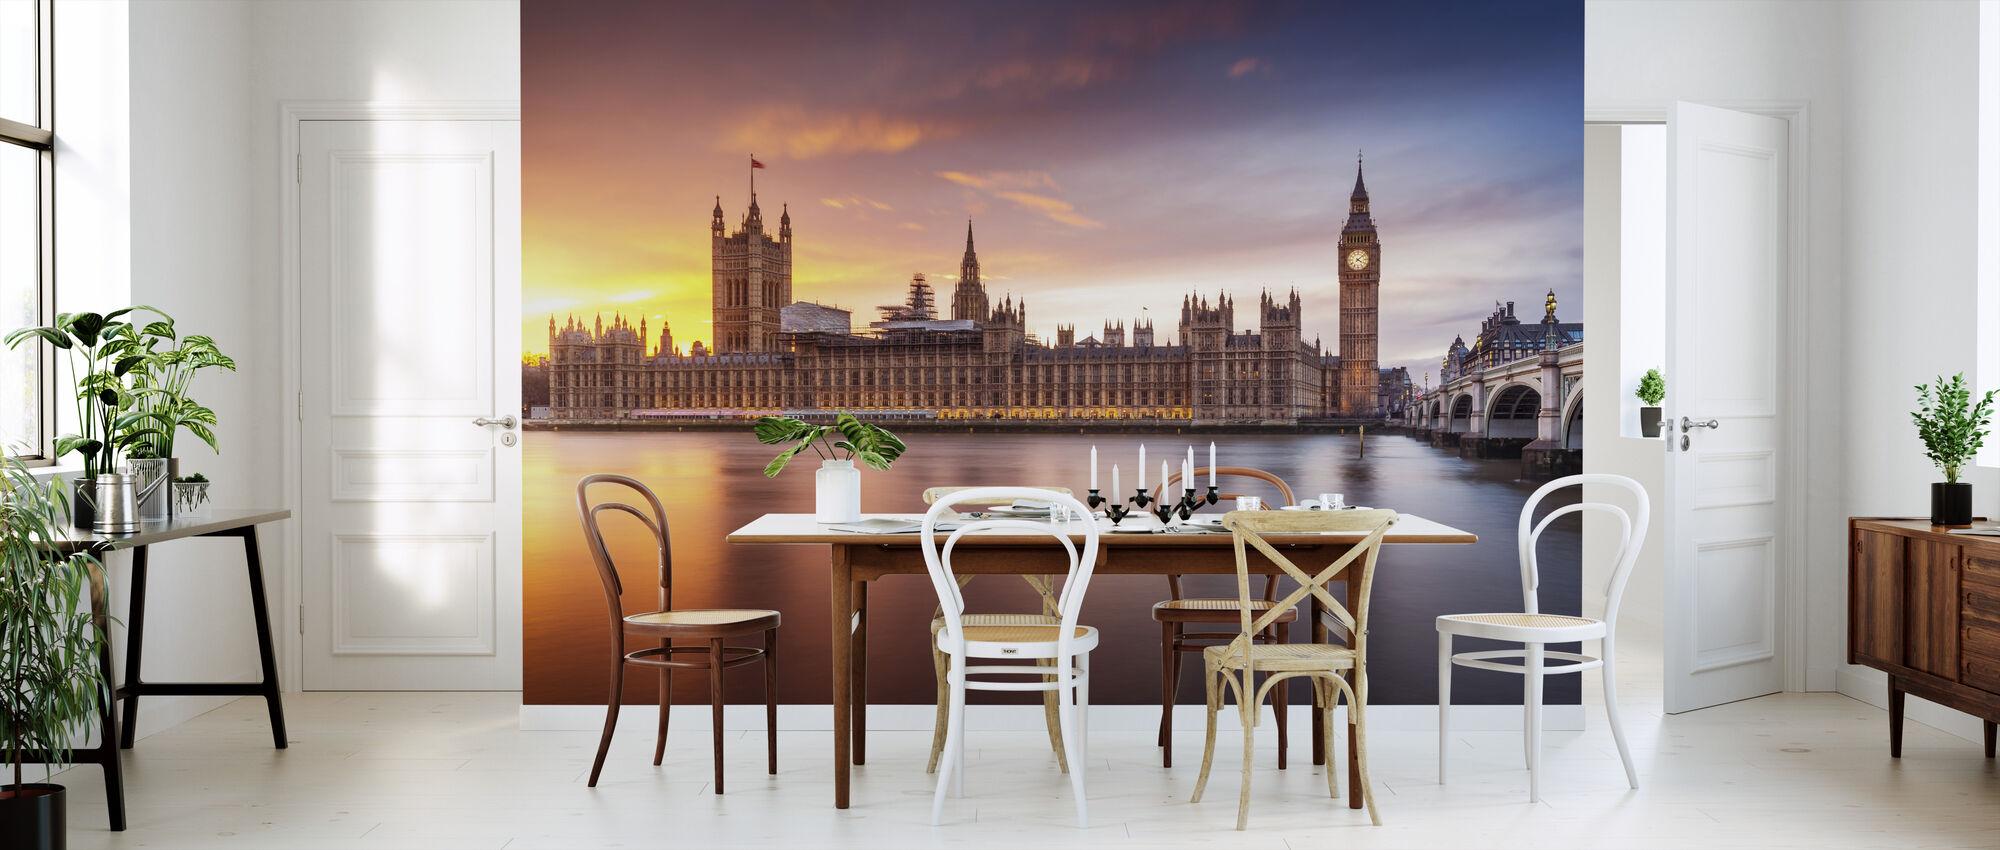 London Palace of Westminster Sunset - Wallpaper - Kitchen